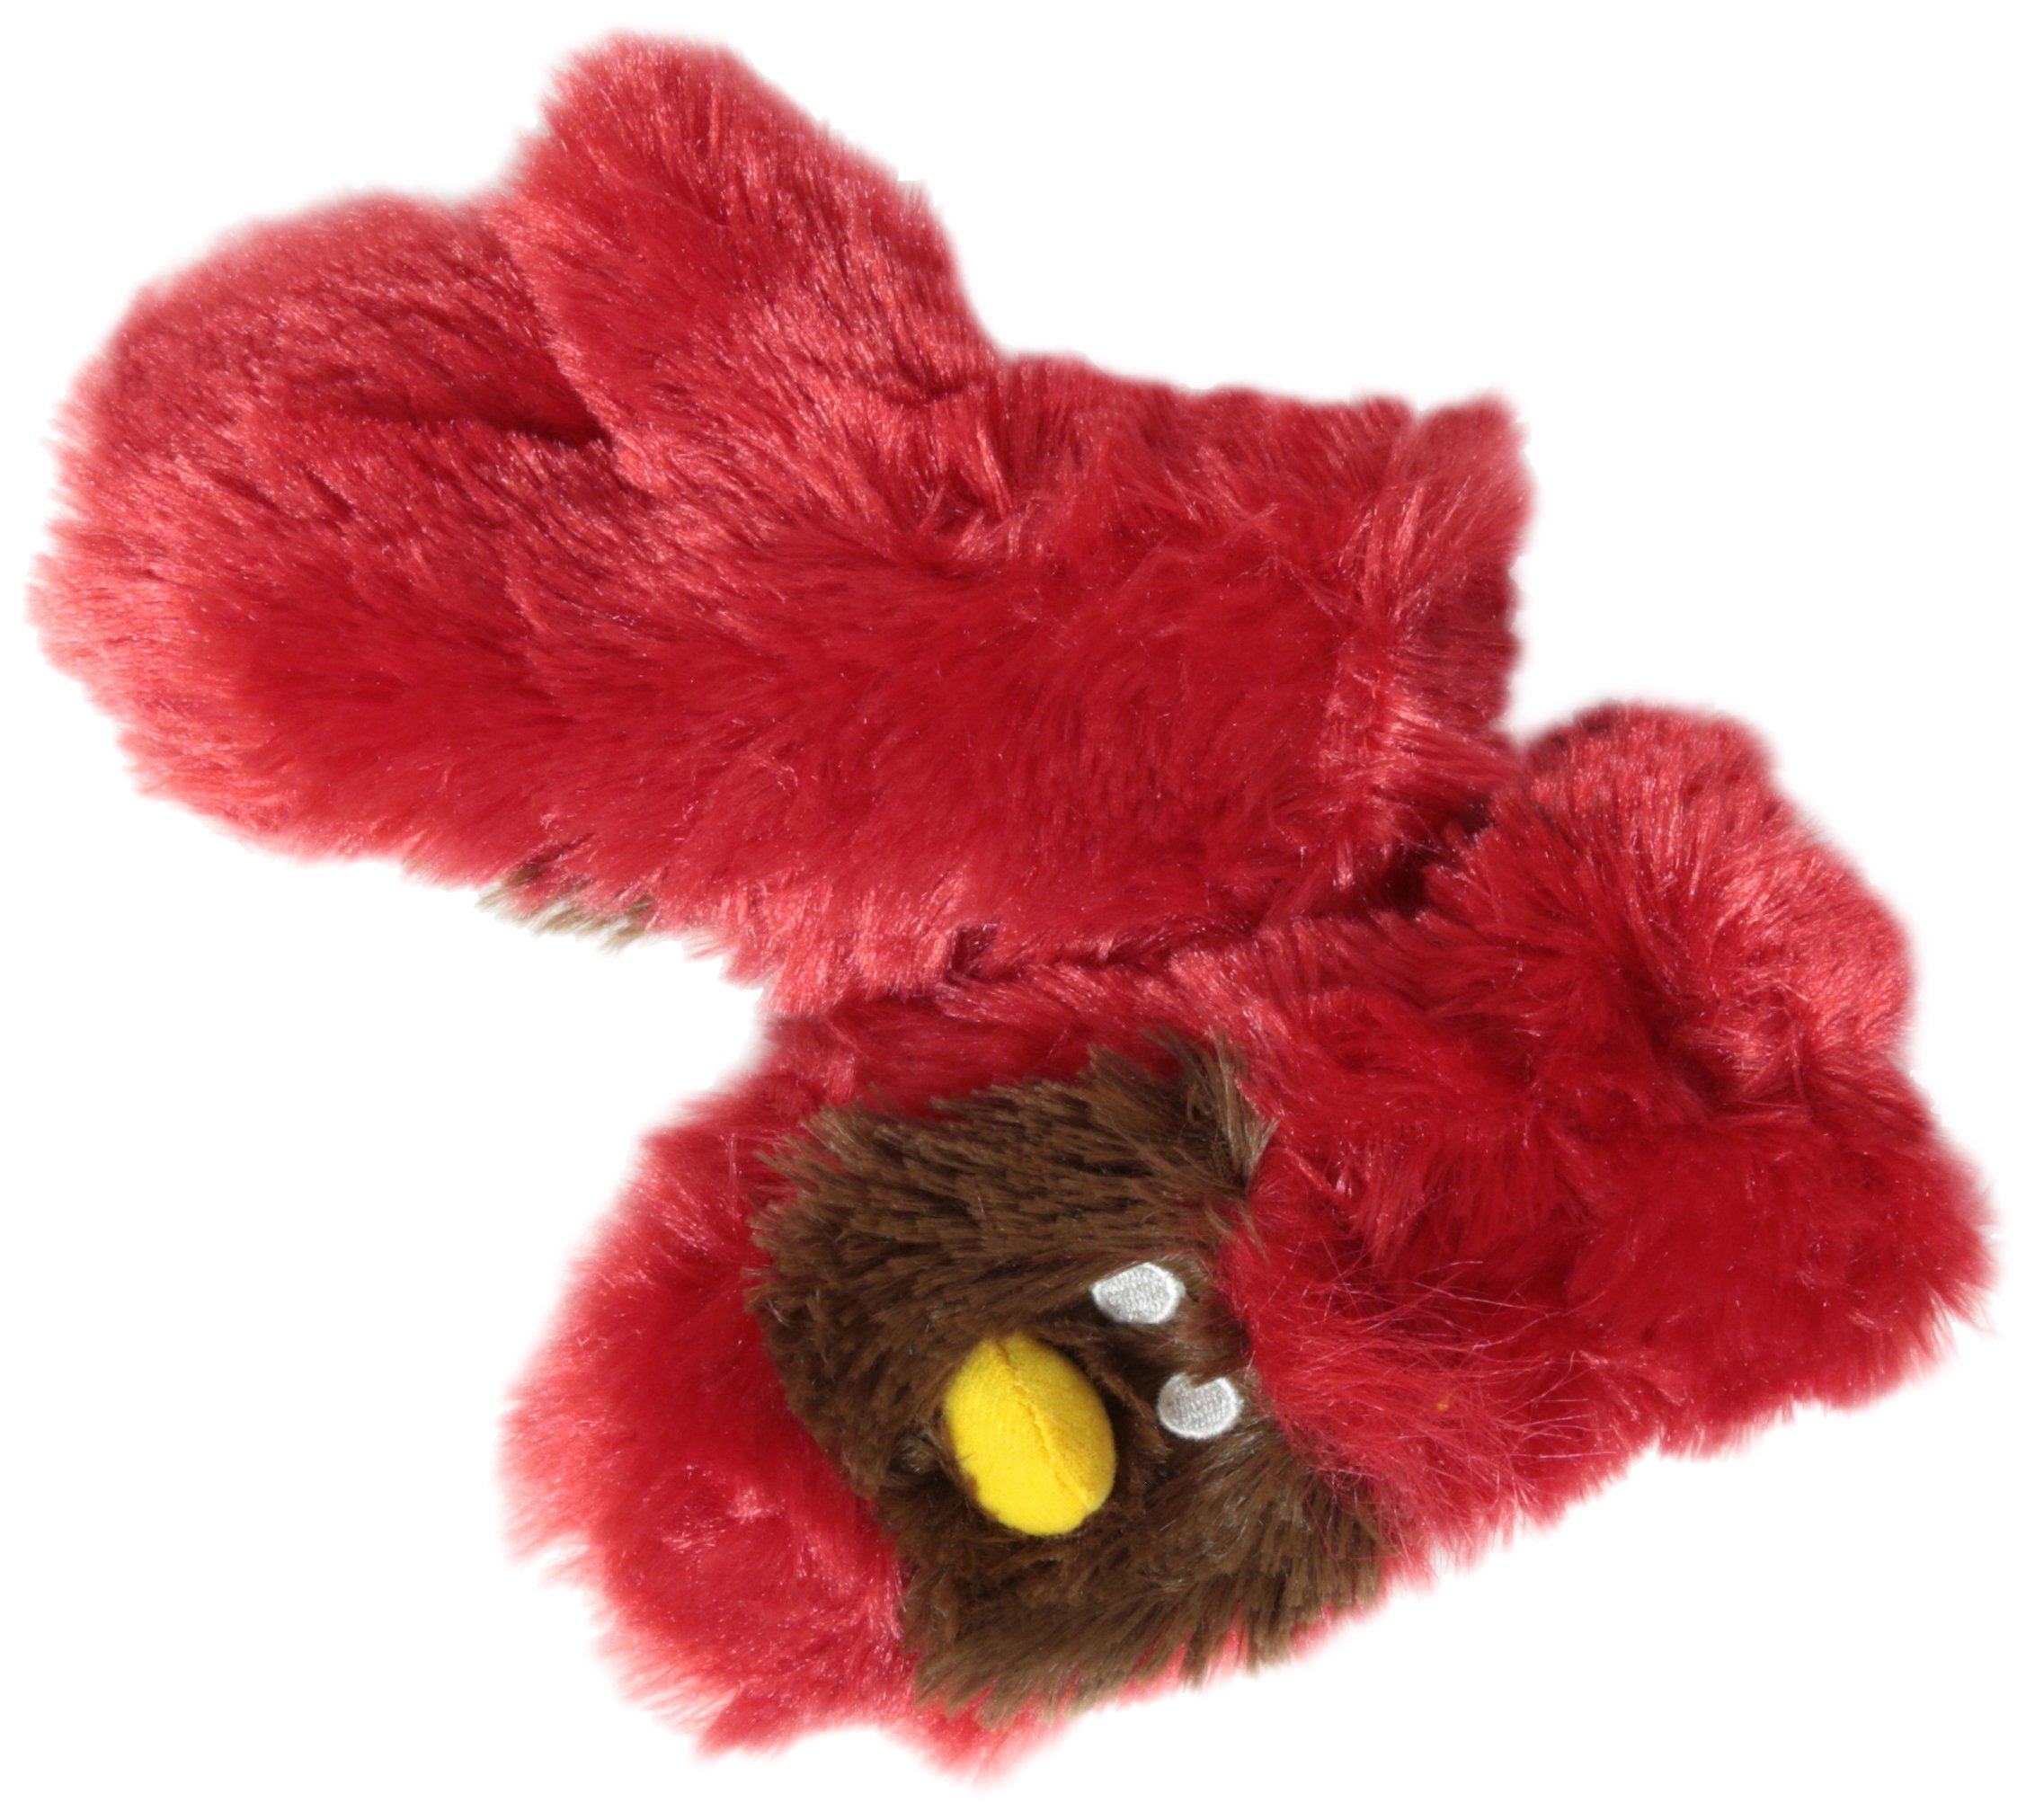 Hatley Little Boys' Fuzzy Fleece Mittens-Cardinal, Red, Small